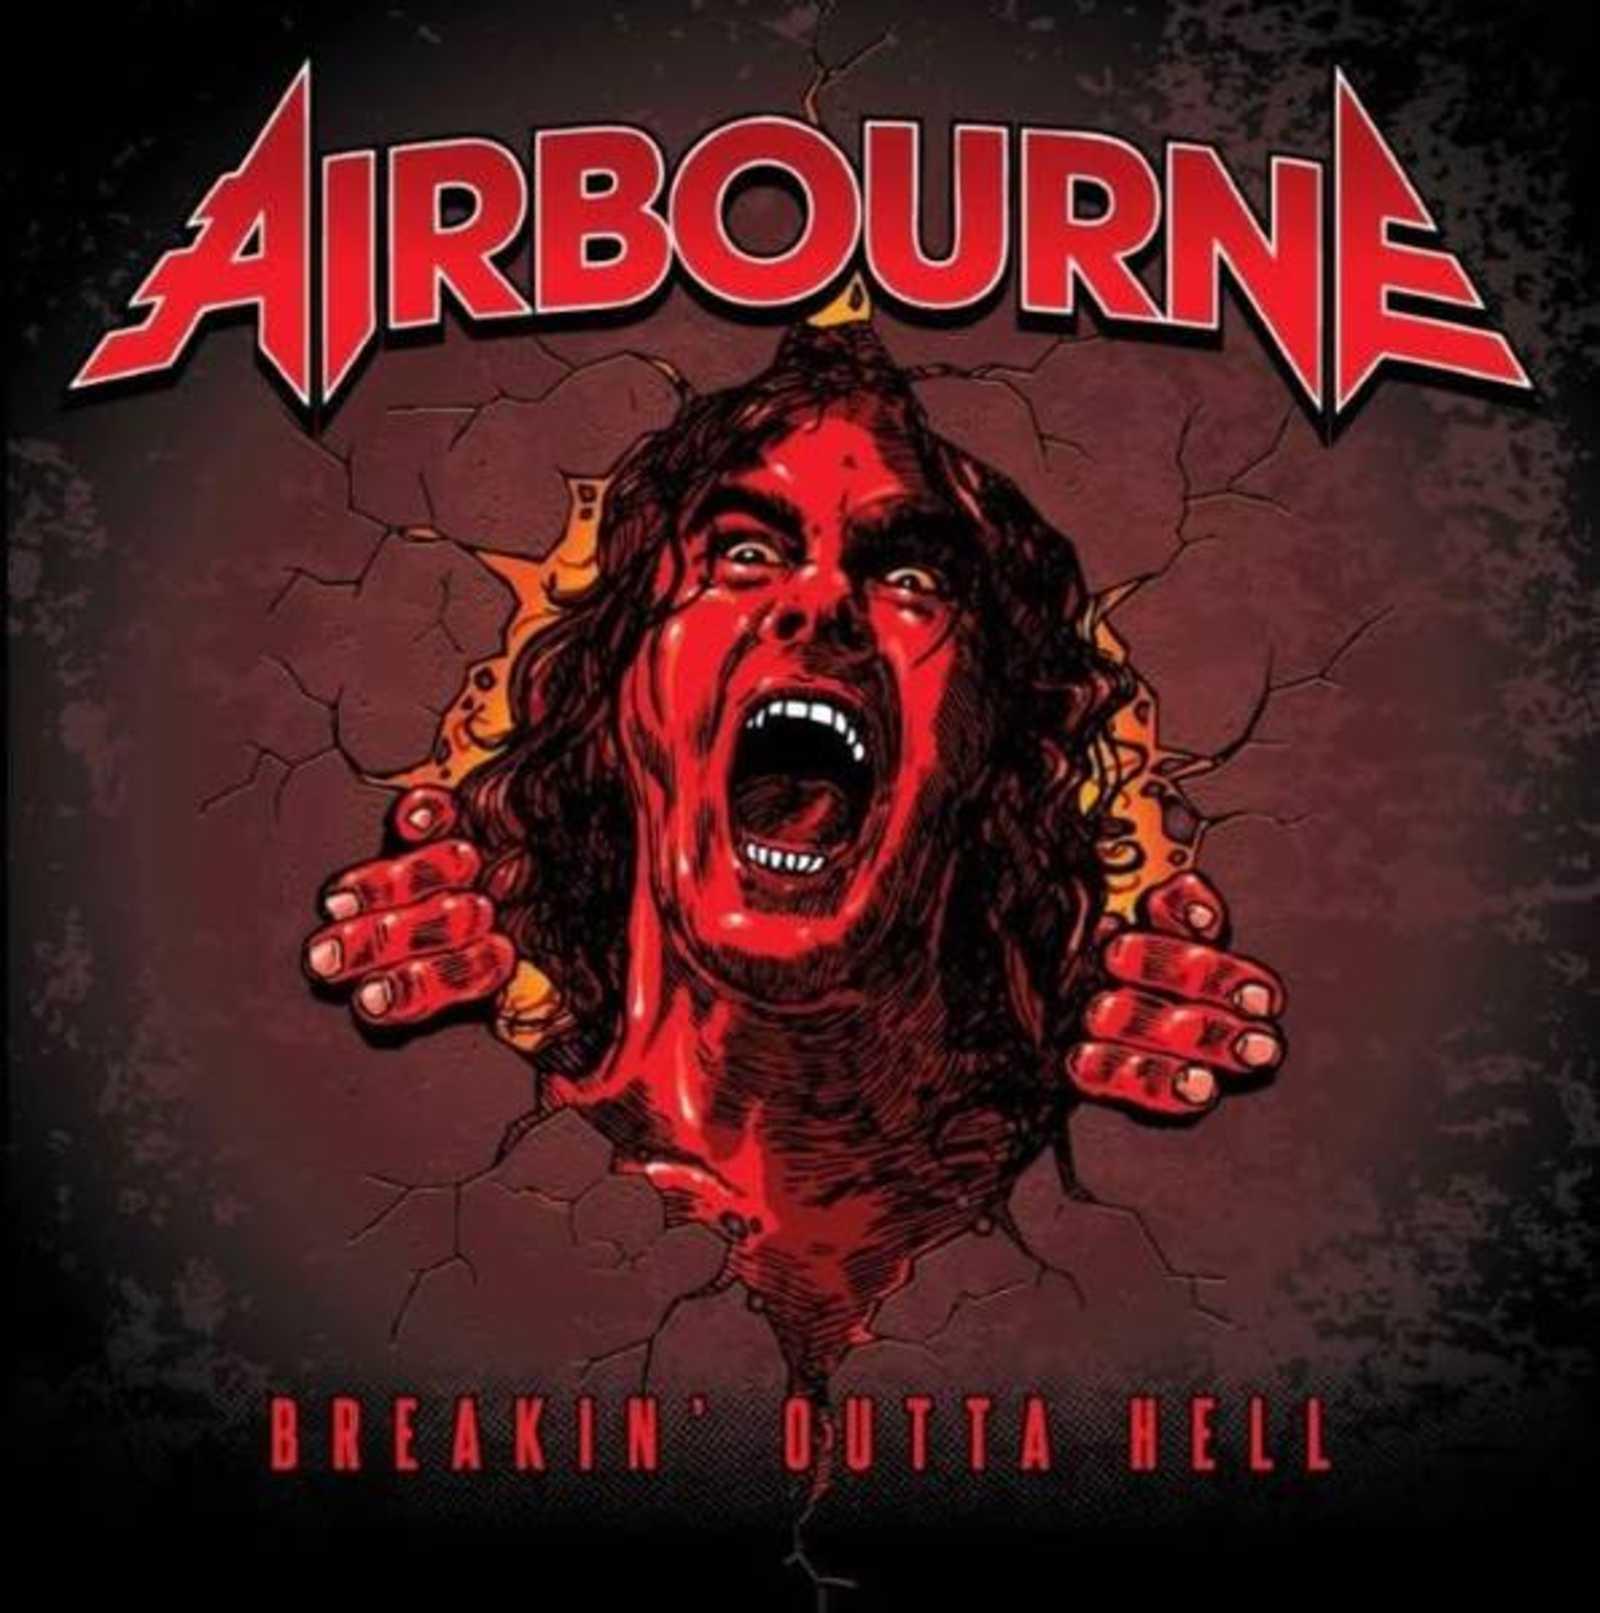 AIRBOURNE PRE-ORDER BUNDLES NOW LIVE!